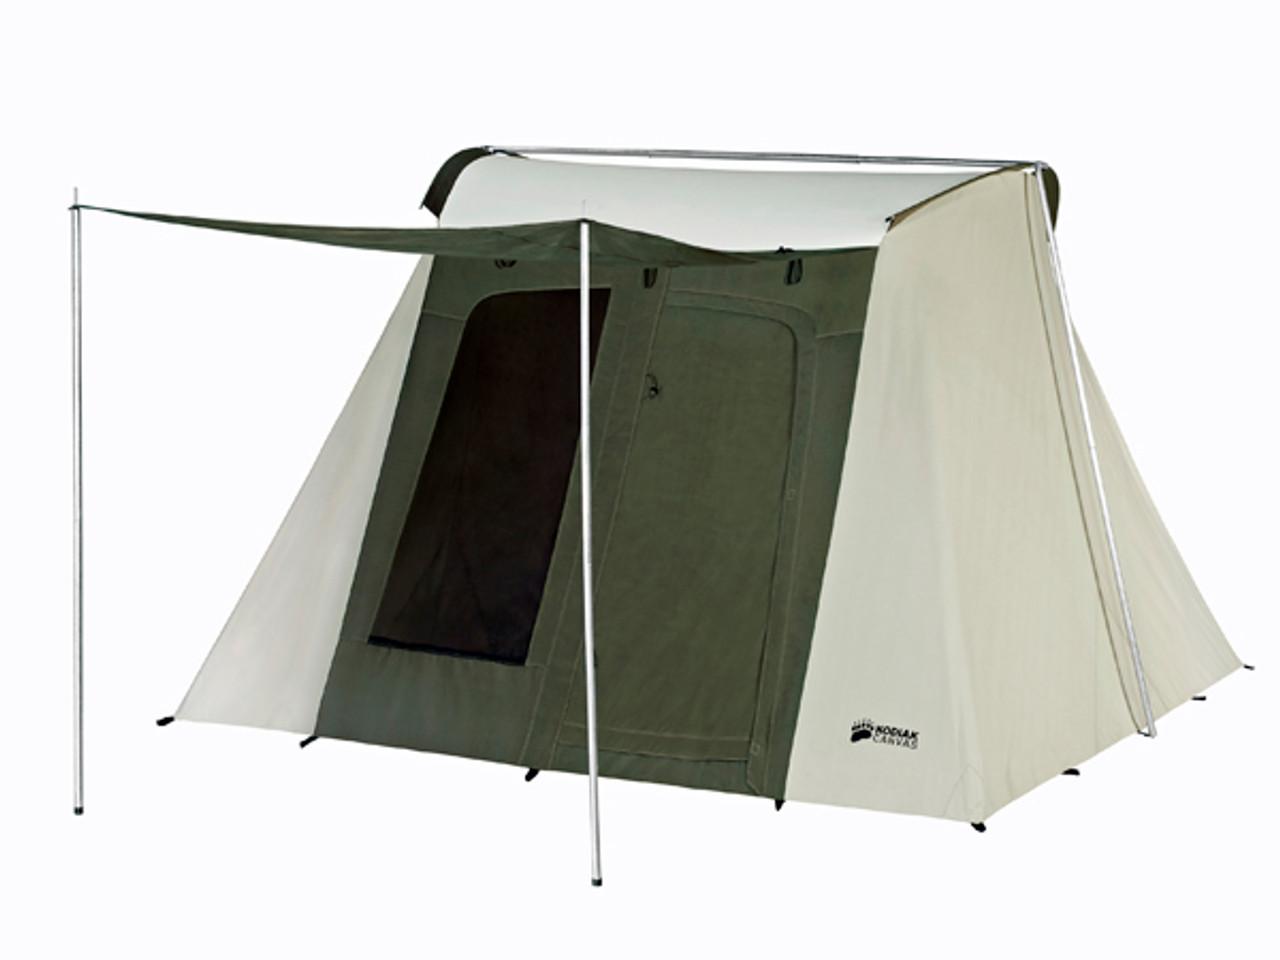 Tent Body 6051 - Estimated Restock Date 10/10/19